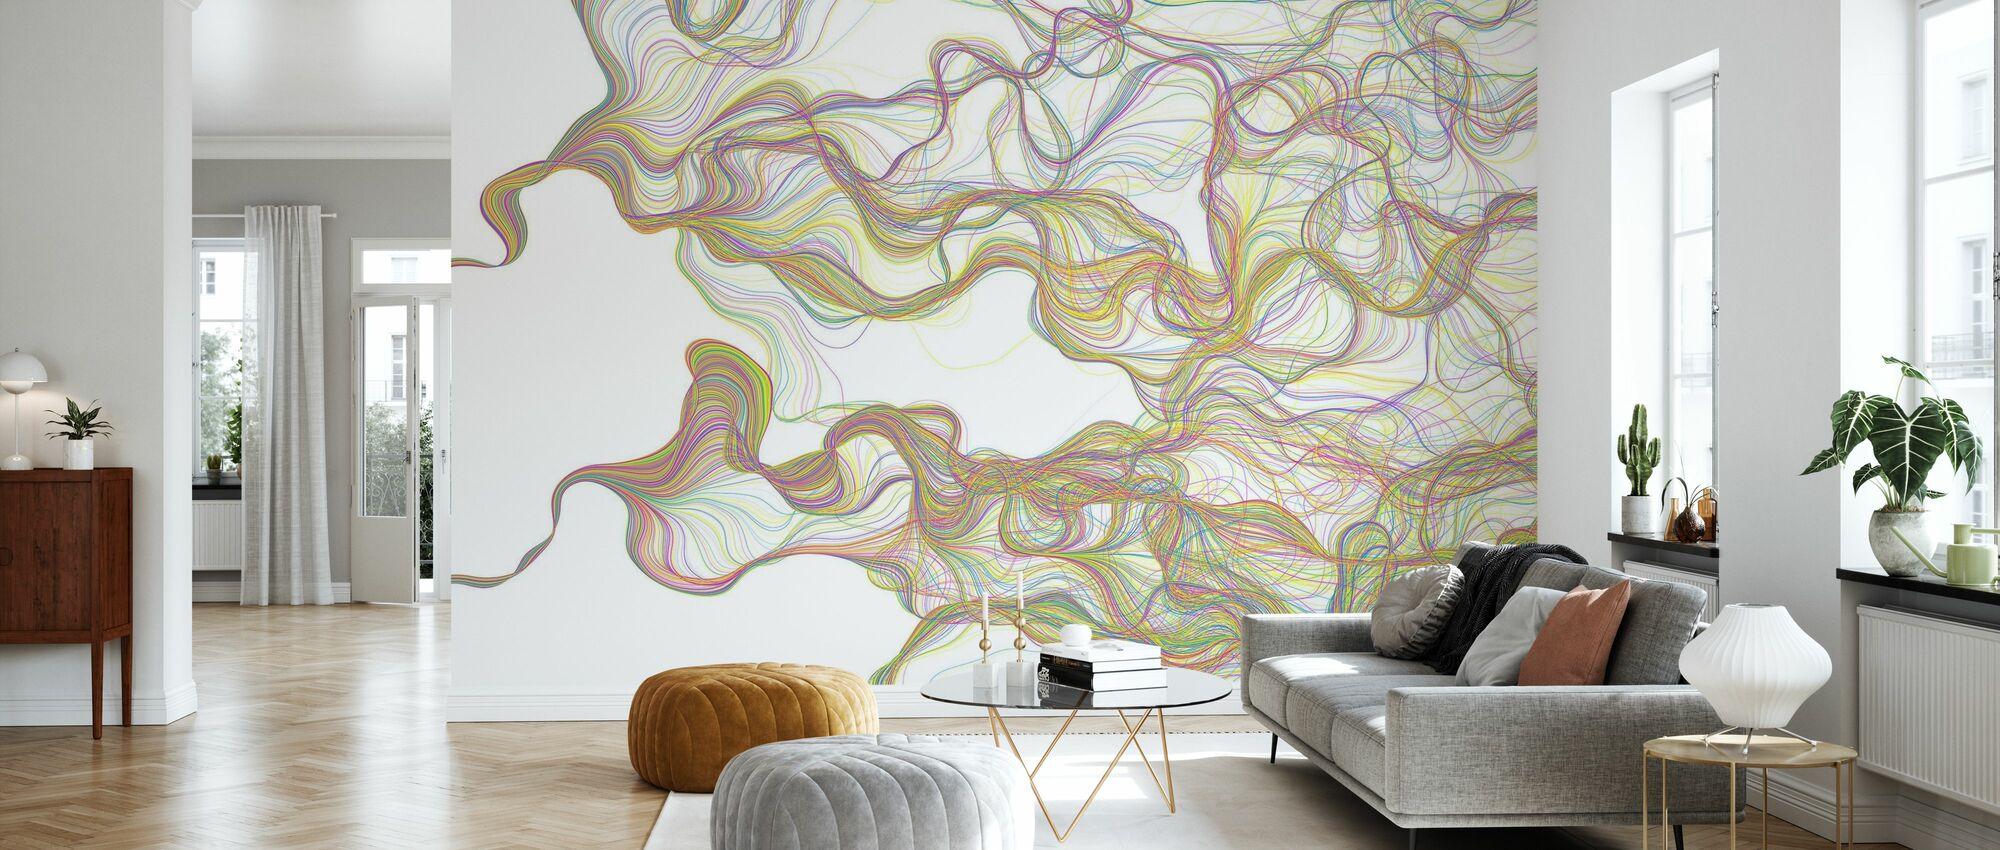 H Torsion Color - Wallpaper - Living Room